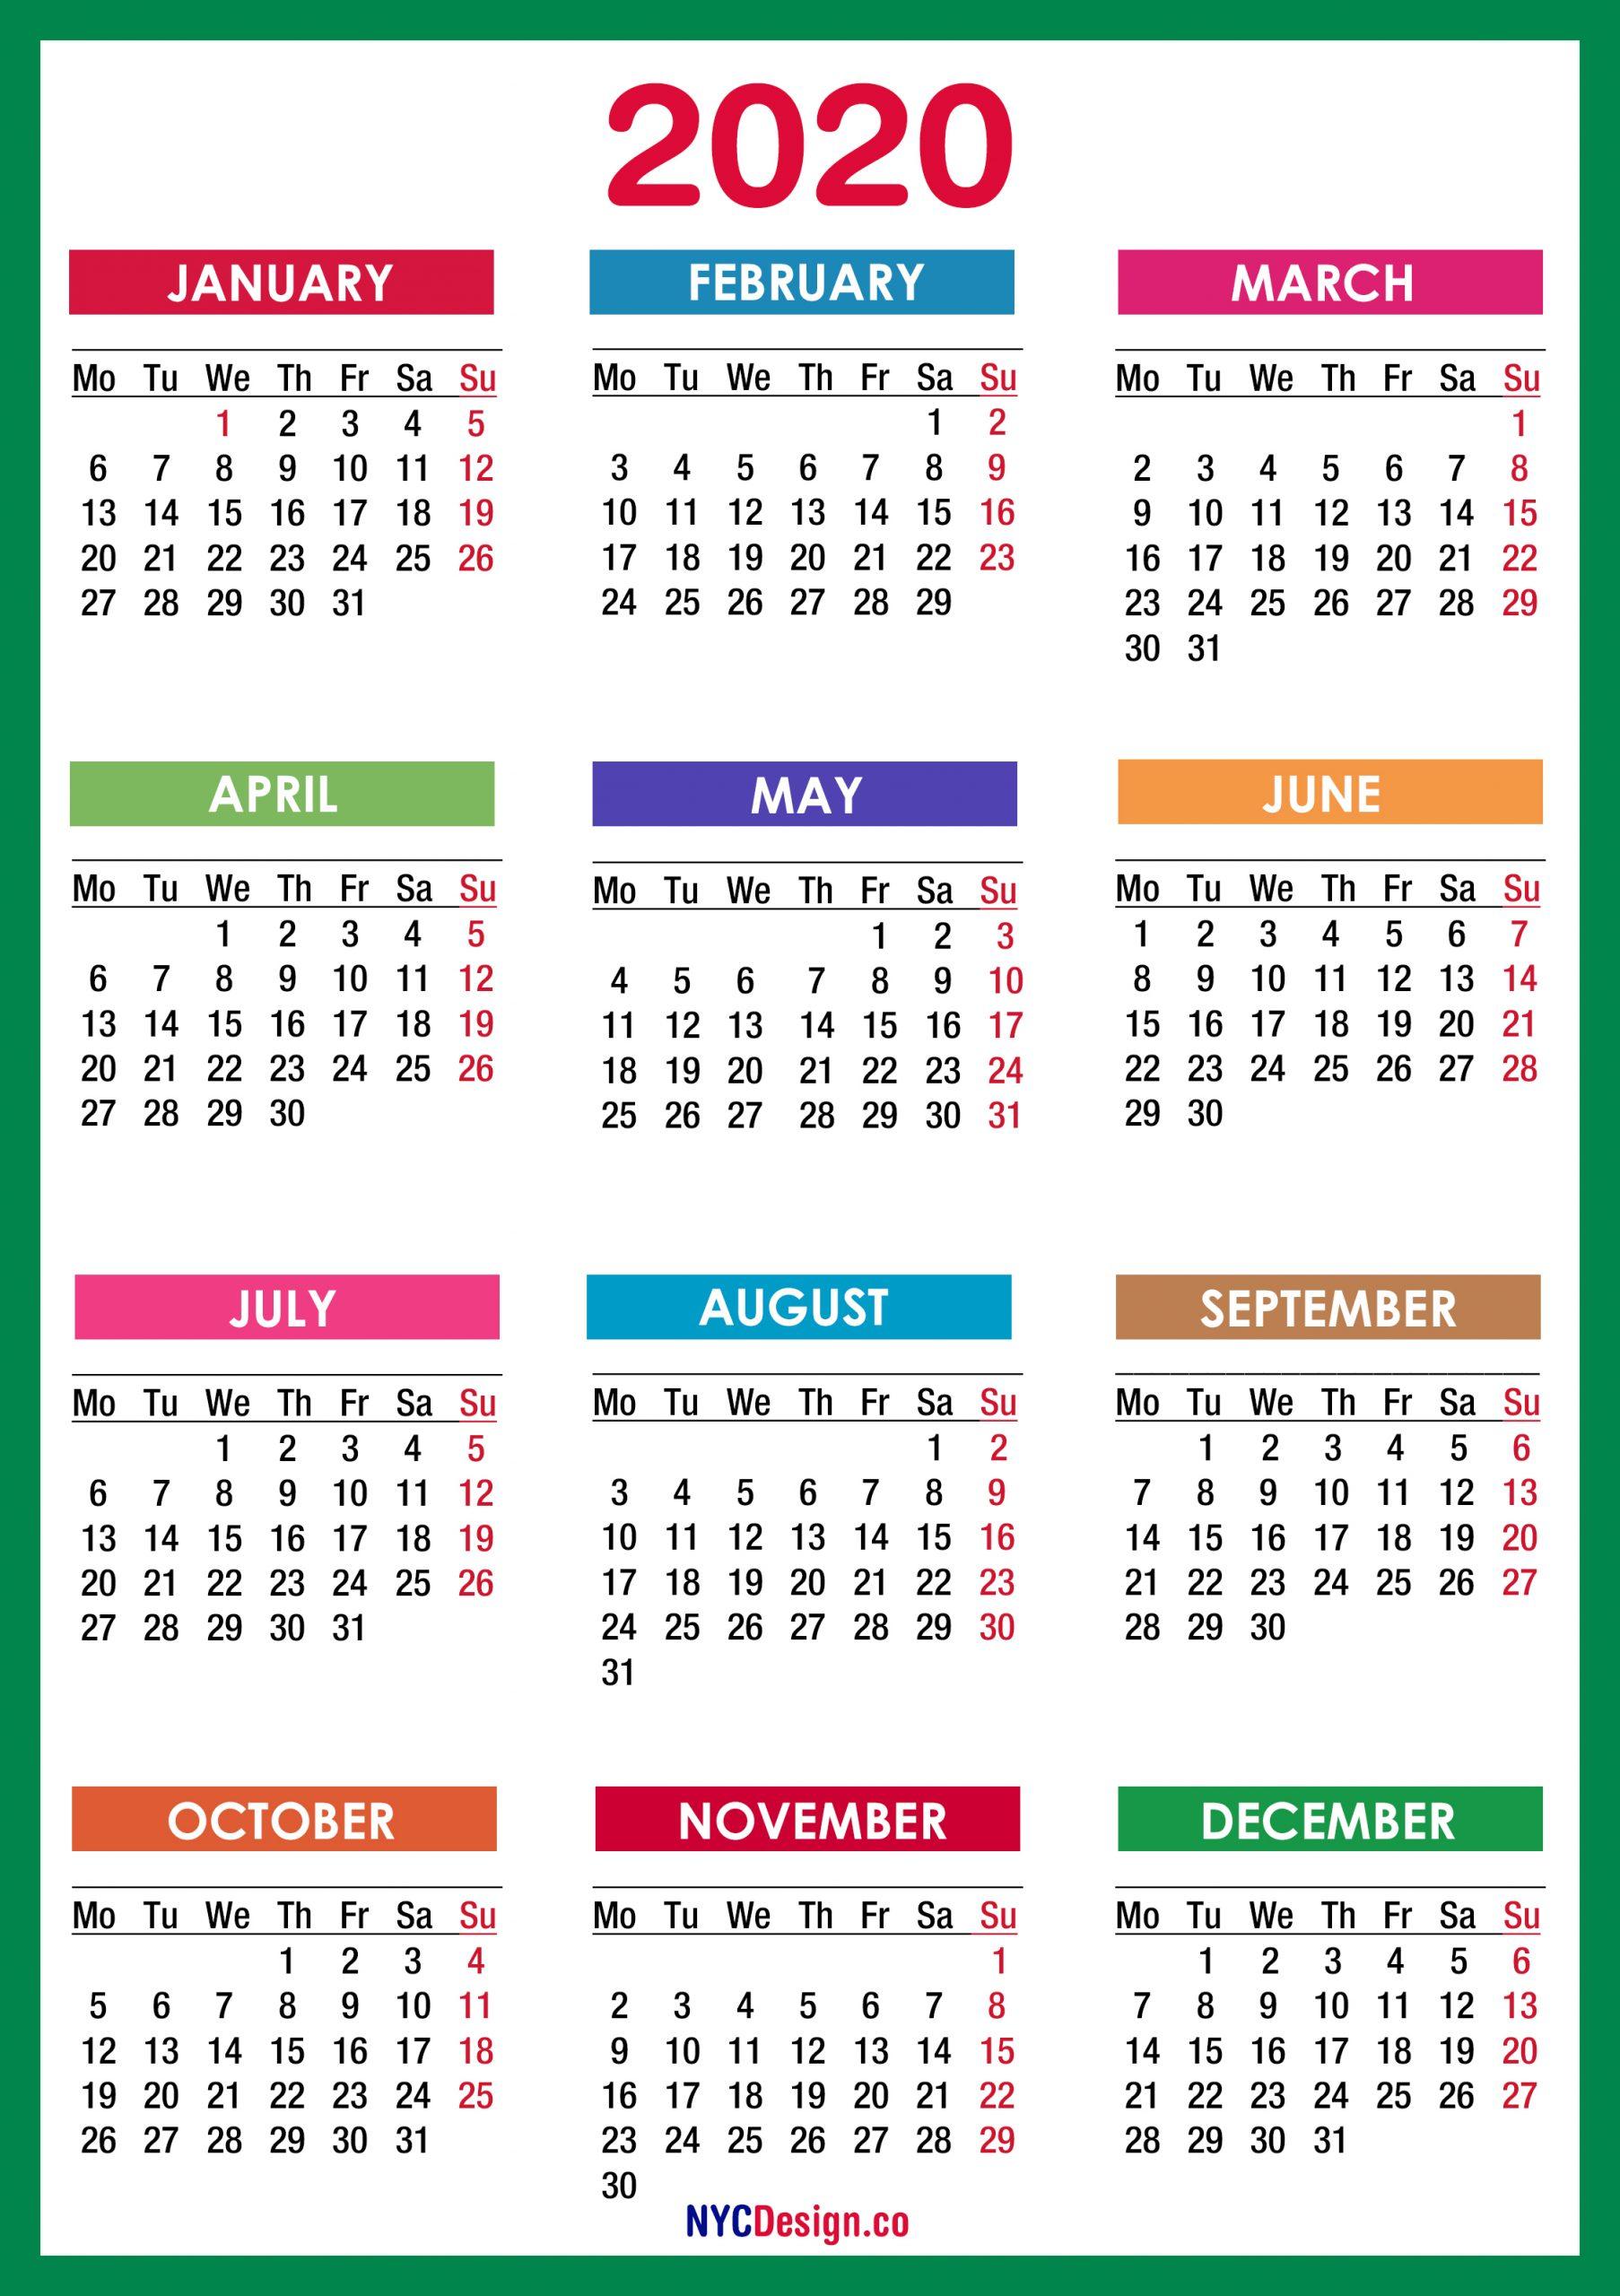 2020 Calendar Printable Free, Pdf, Colorful, Blue, Green